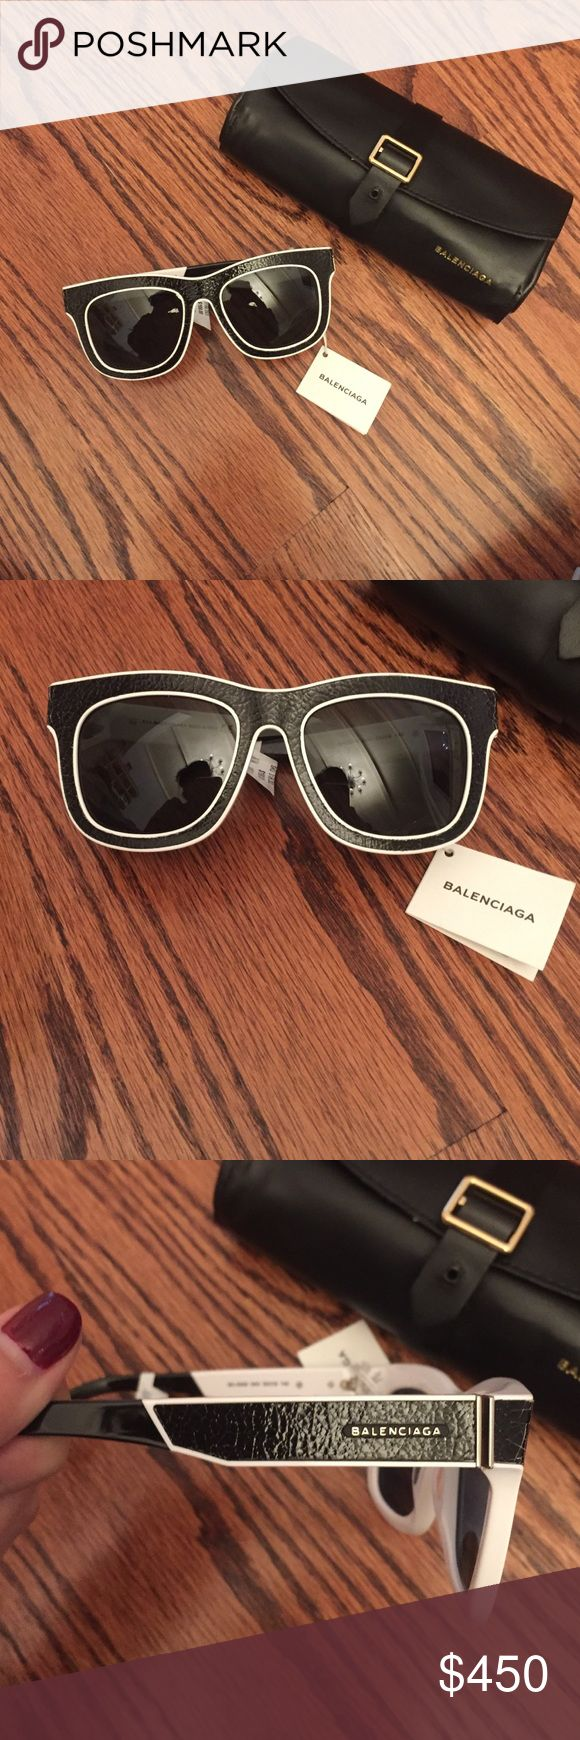 Authentic Balenciaga Sunglasses 100% Authentic NWT Black Cracked Leather Balenciaga Sunglasses 2016 Balenciaga Accessories Sunglasses